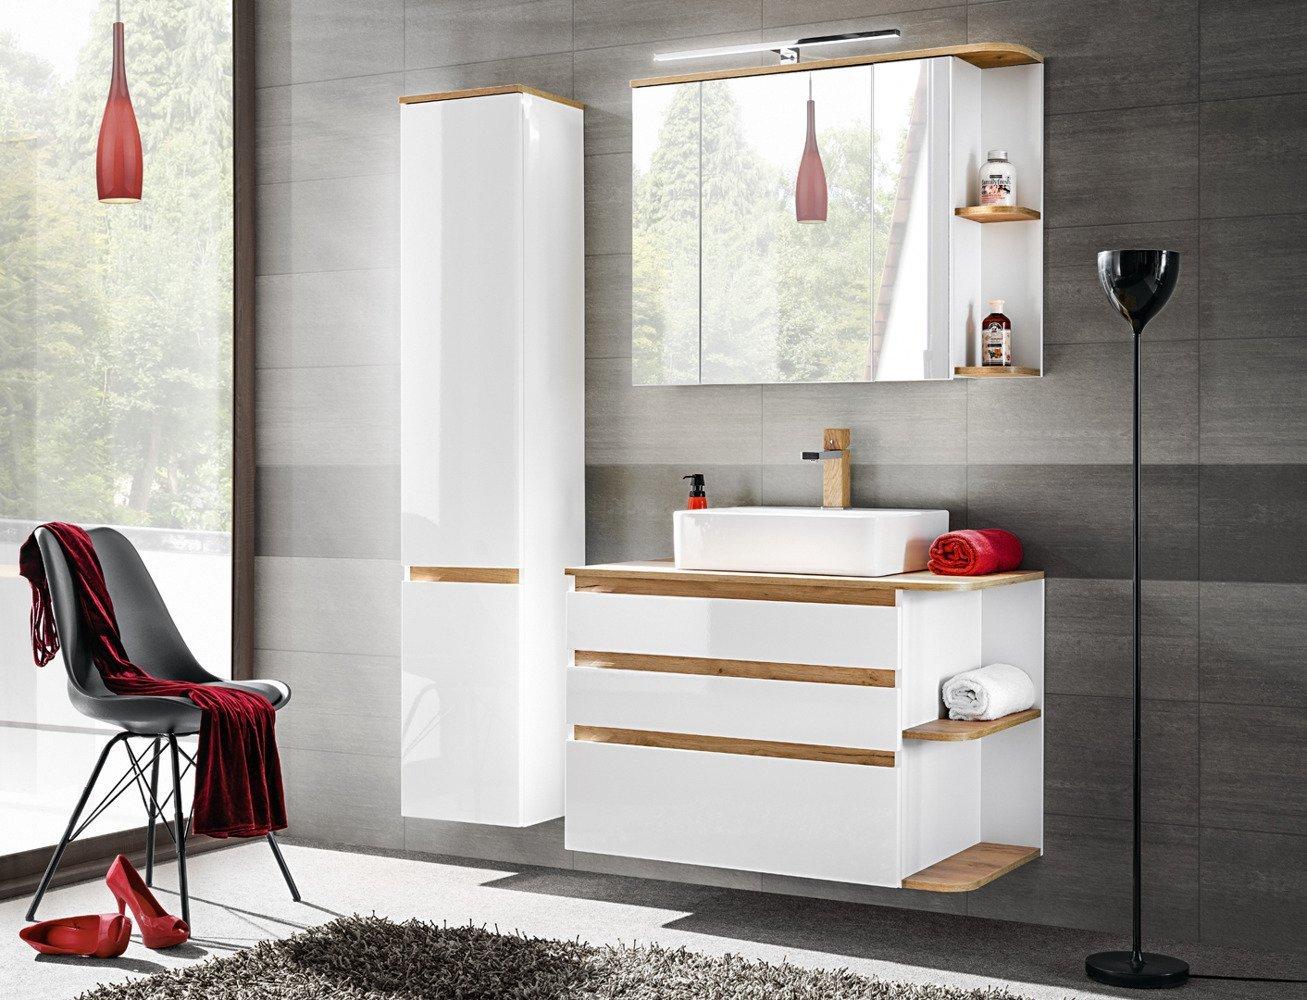 Szafka łazienkowa Pod Umywalkę 90 Cm Platinum Asortyment Meble